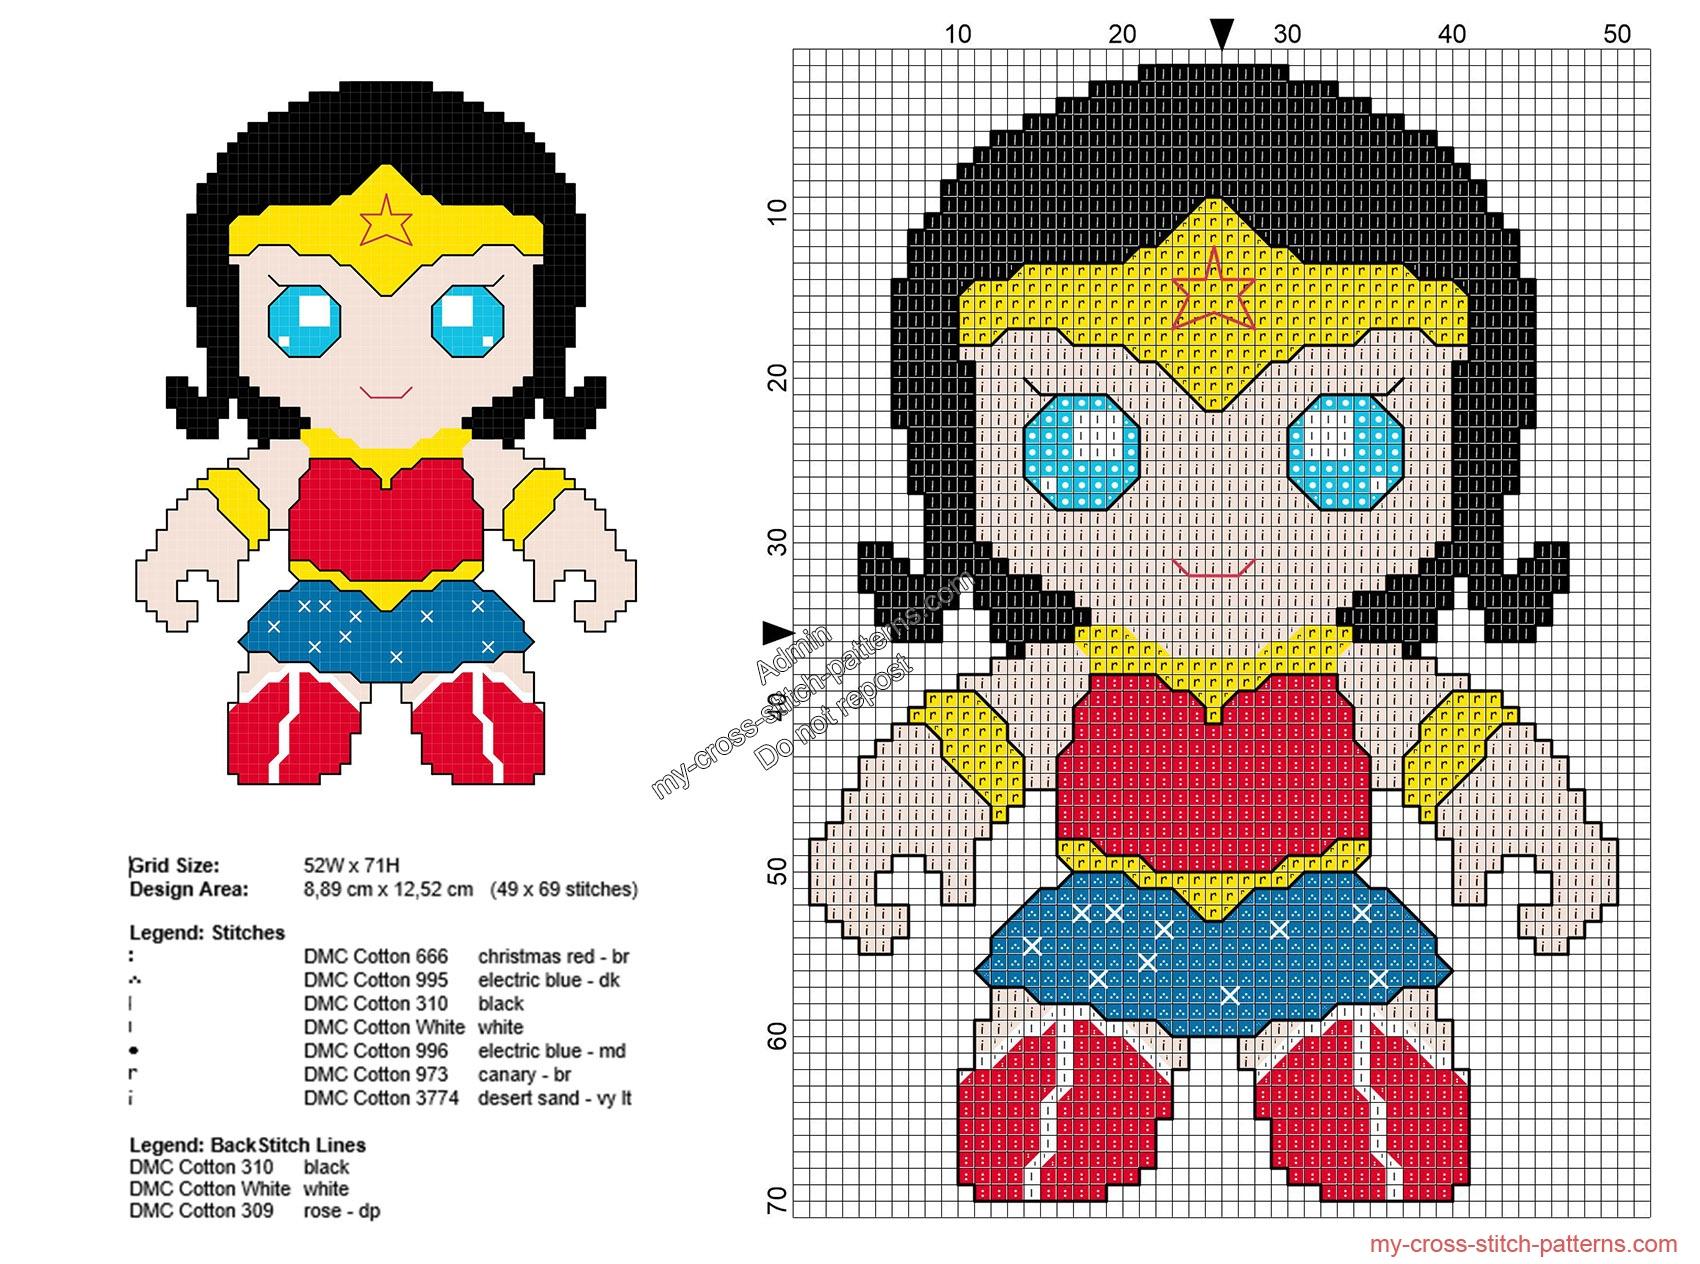 baby_wonder_woman_free_superheroes_cross_stitch_patterns_49x69